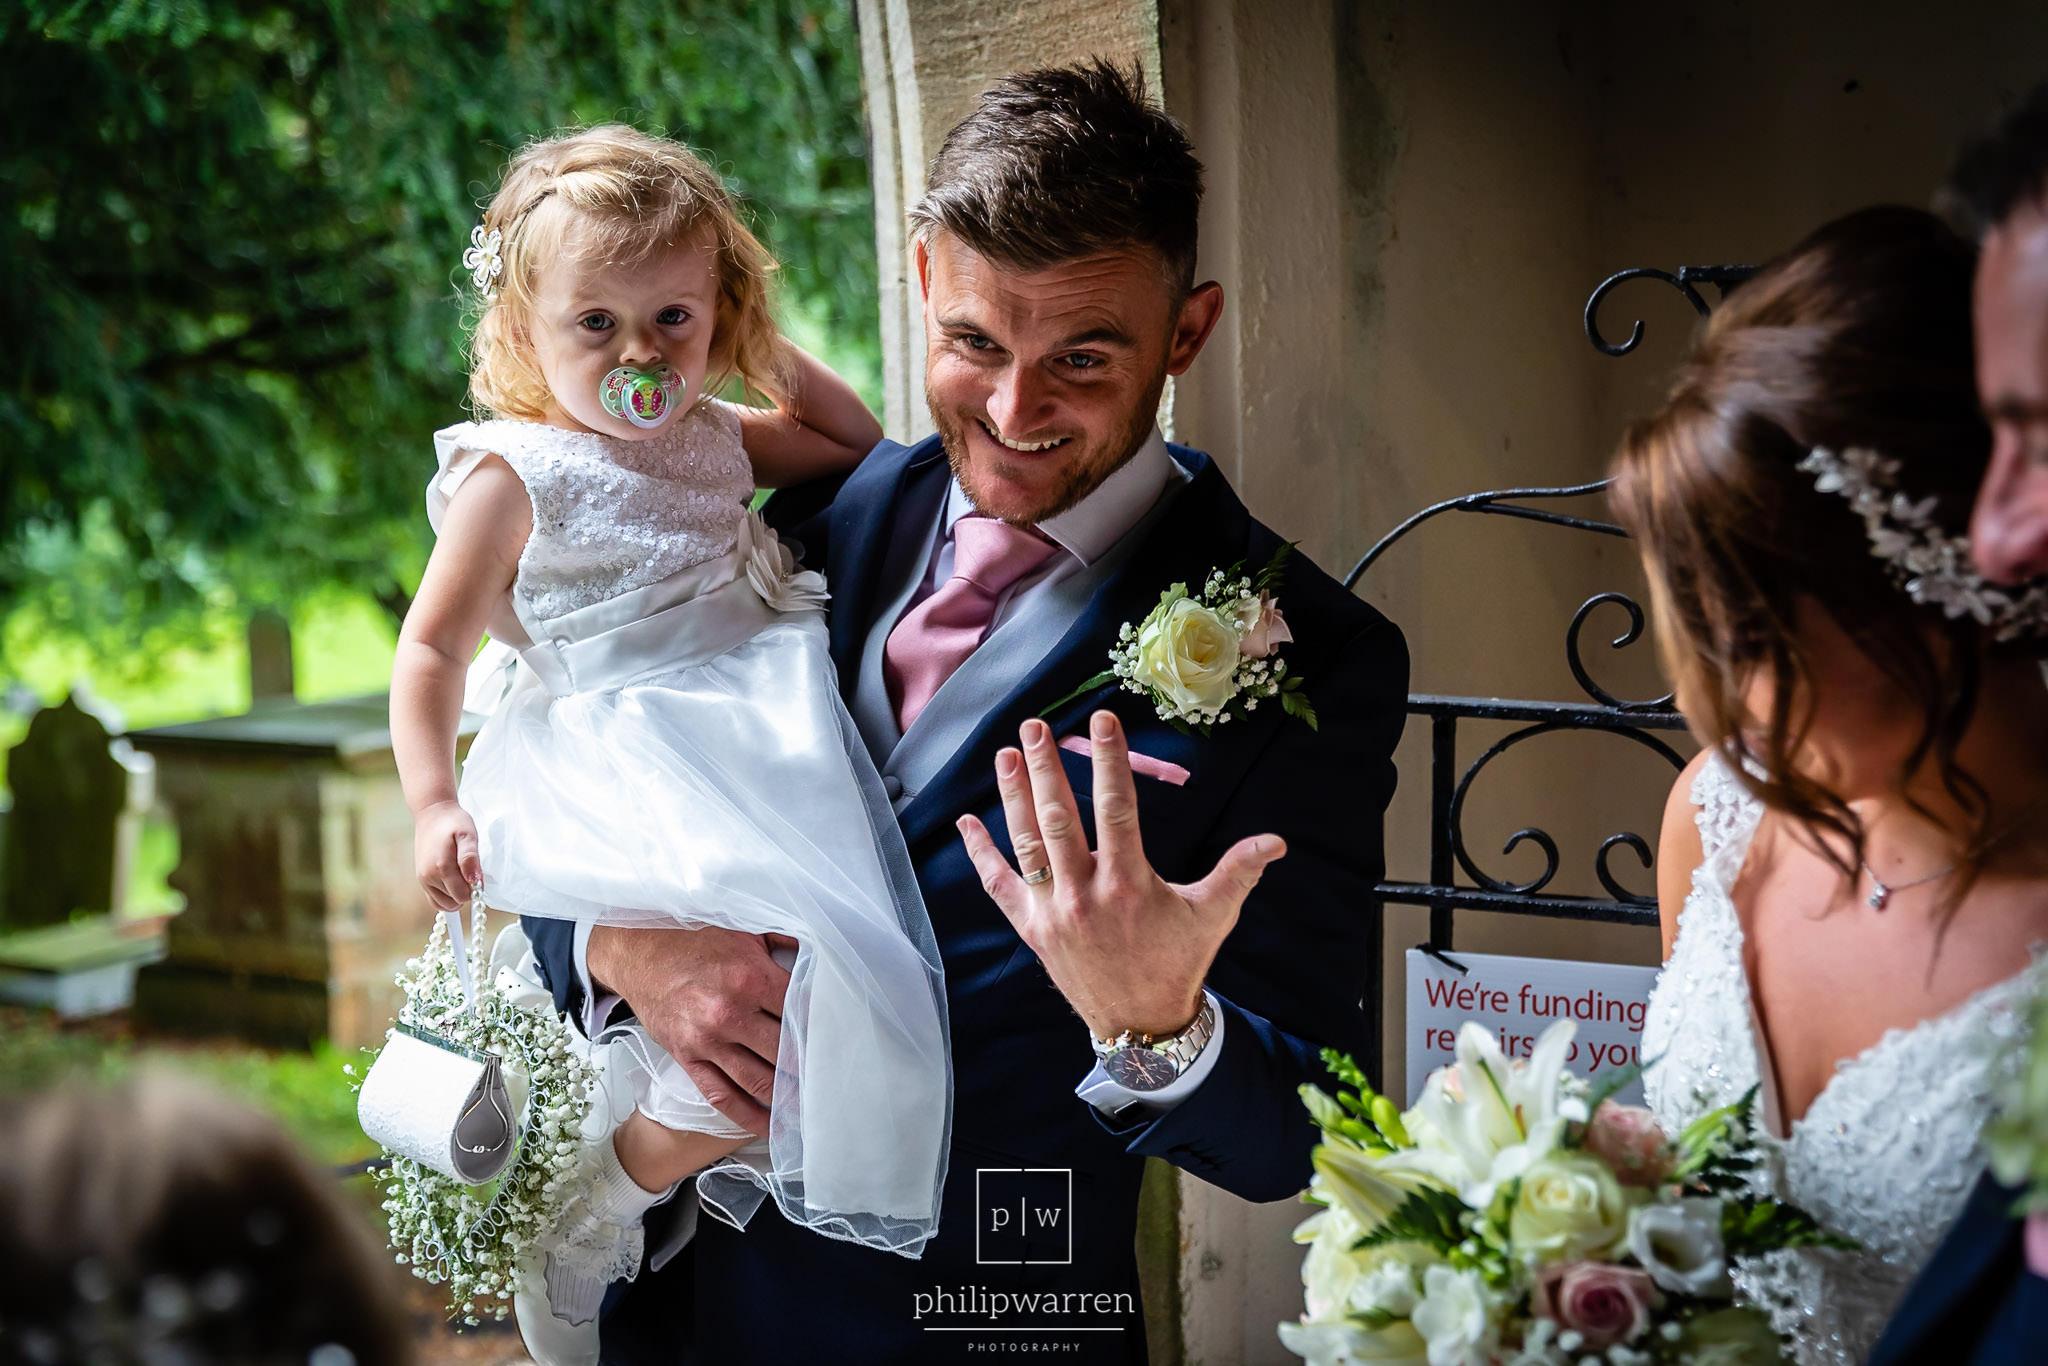 groom looking surprised at his new wedding ring